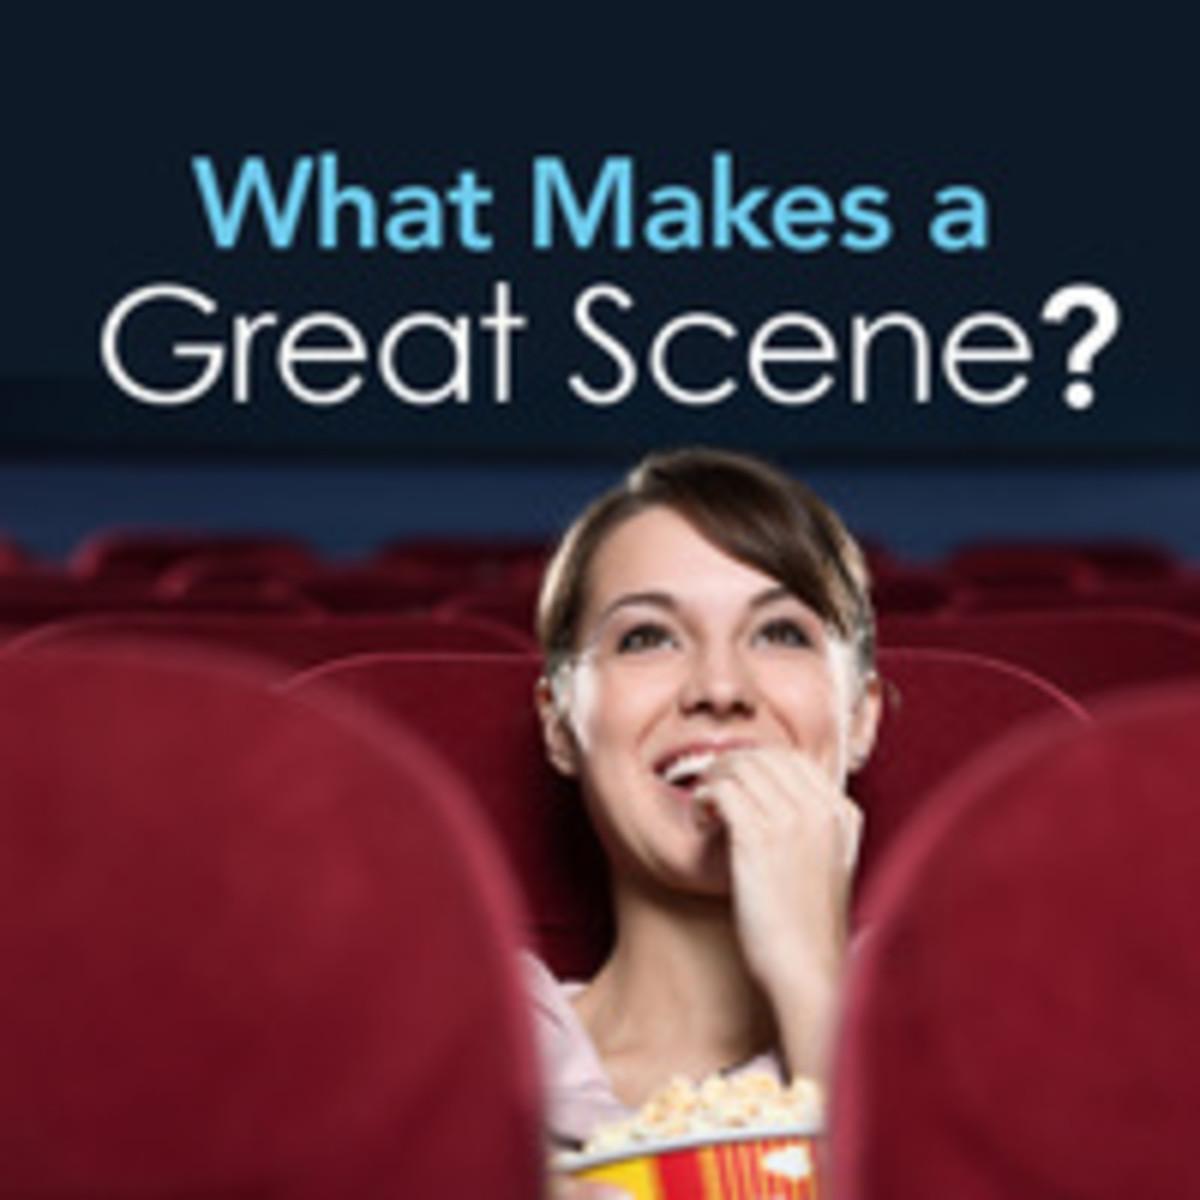 greatscene_product_small